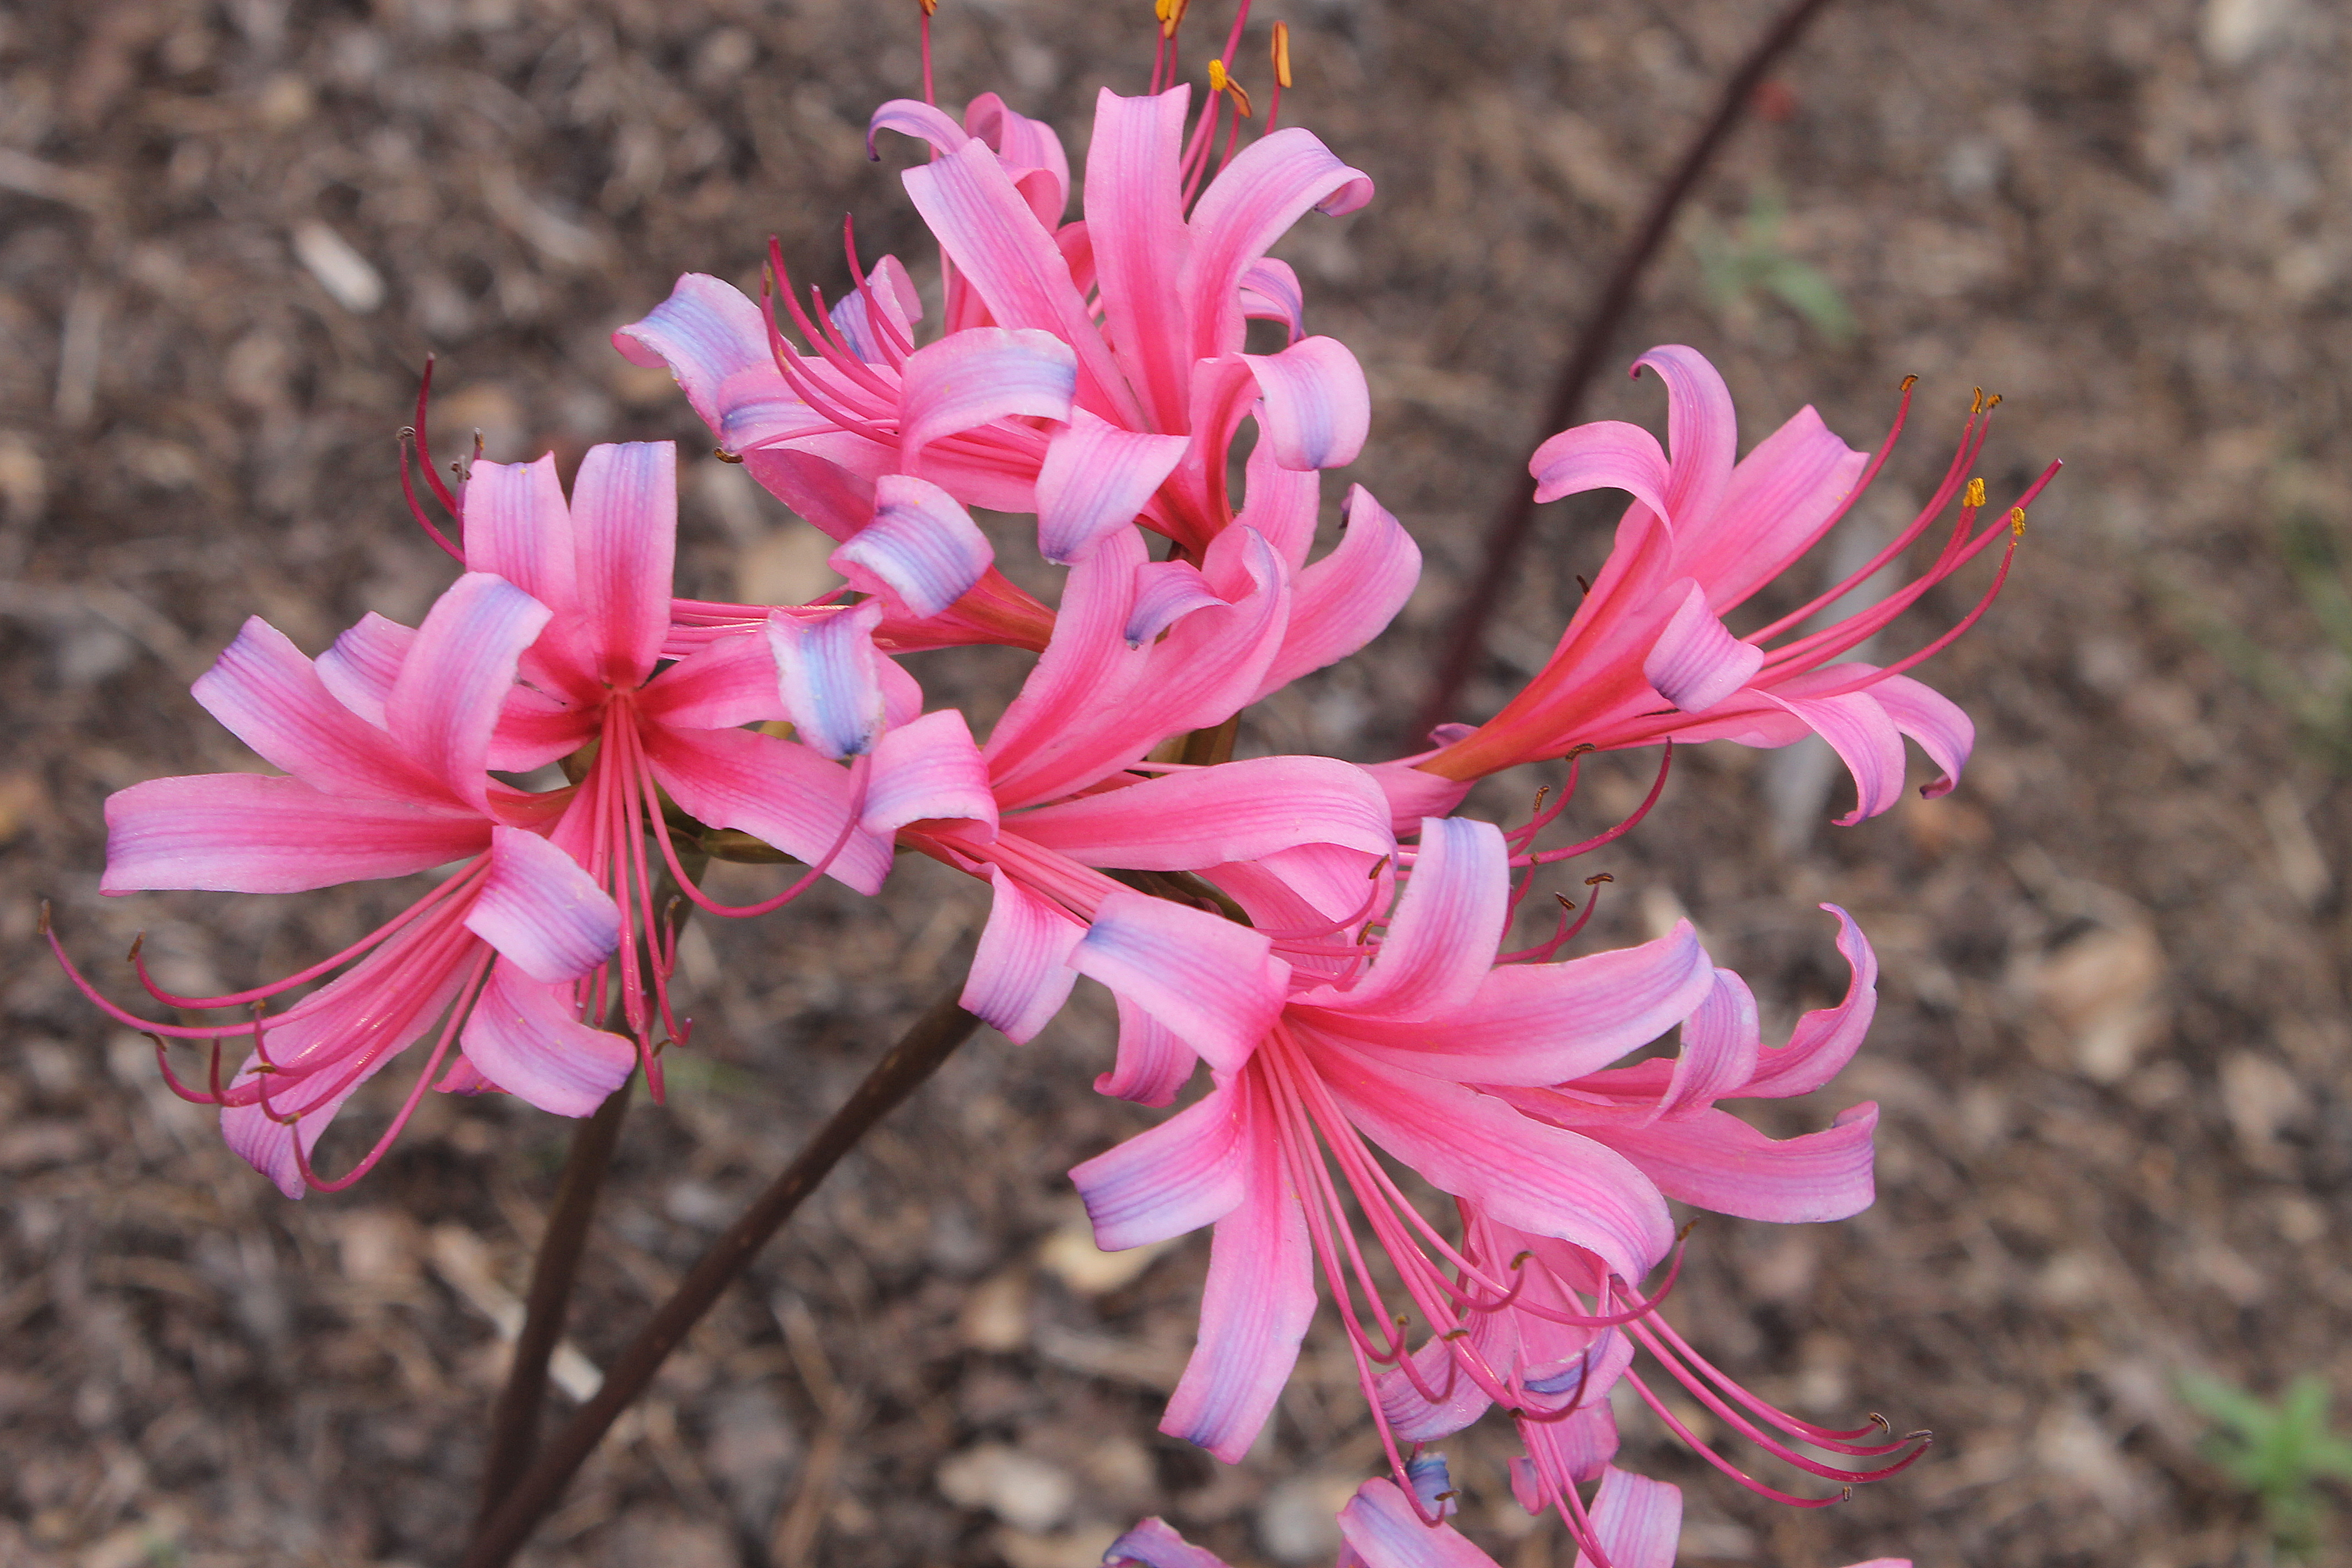 Lycoris x rosea 'Flamenco Dancer' @ JLBG - a Phil Adams fertile hybrid of Lycoris radiata var. pumila x sprengeri, named by JLBG/PDN